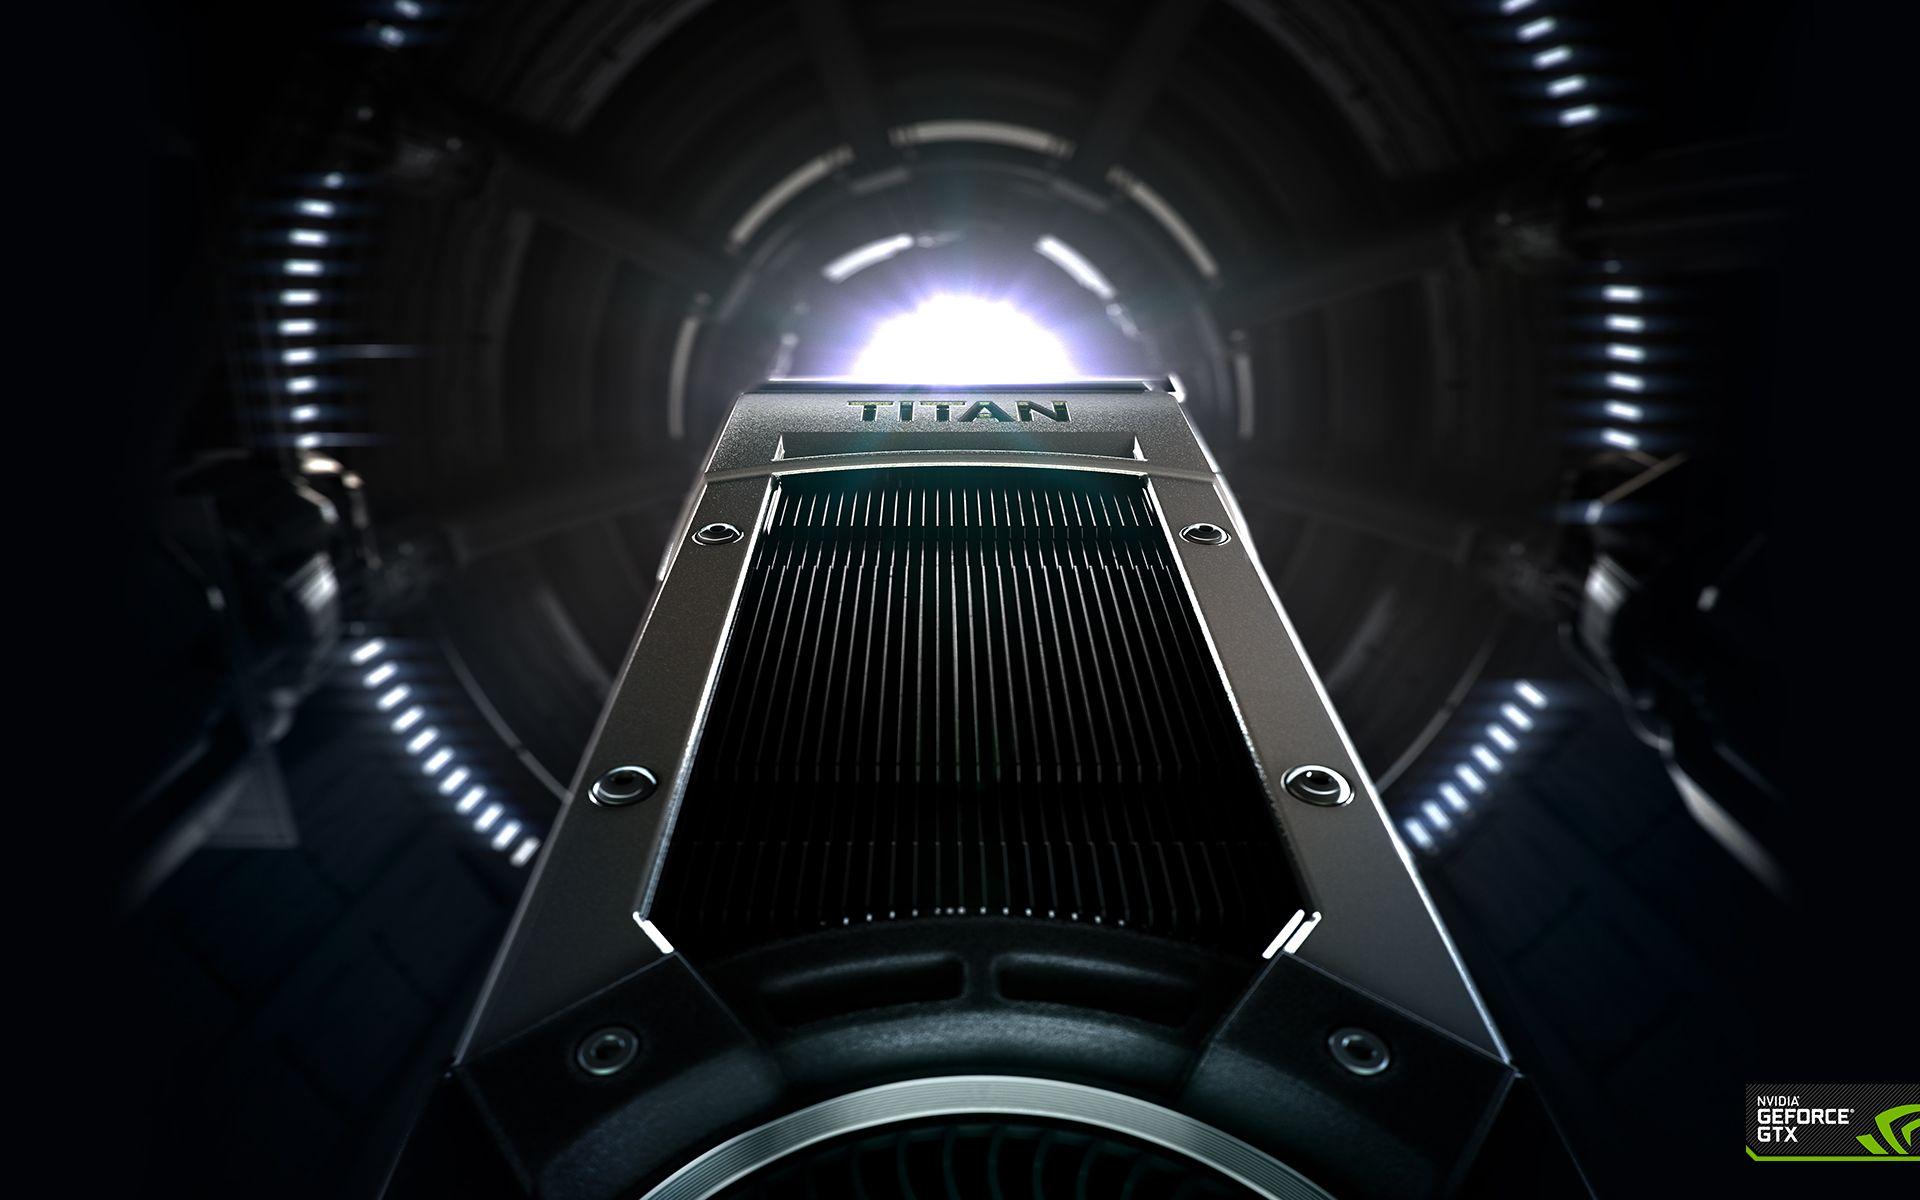 GTX-Titan-1920X1200-Wallpaper-1A.jpg (imagem JPEG, 1920 × 1200 pixels) - Redimensionada (83%)